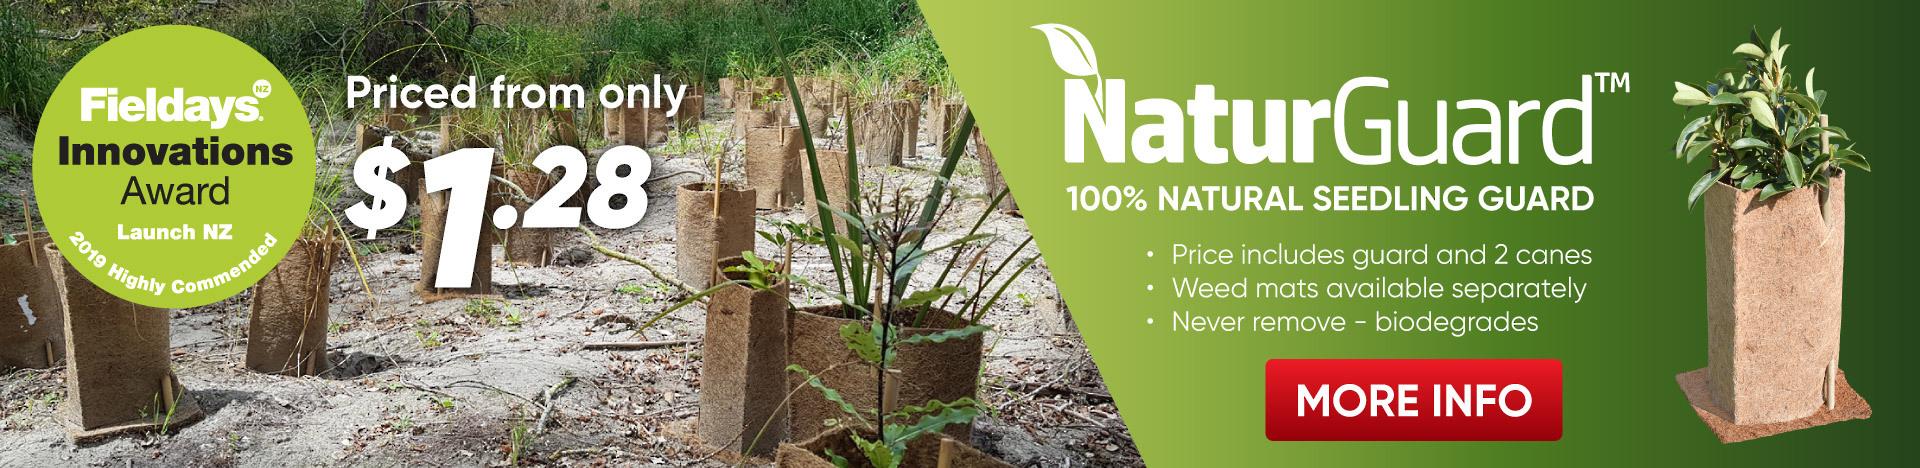 Naturguard promo